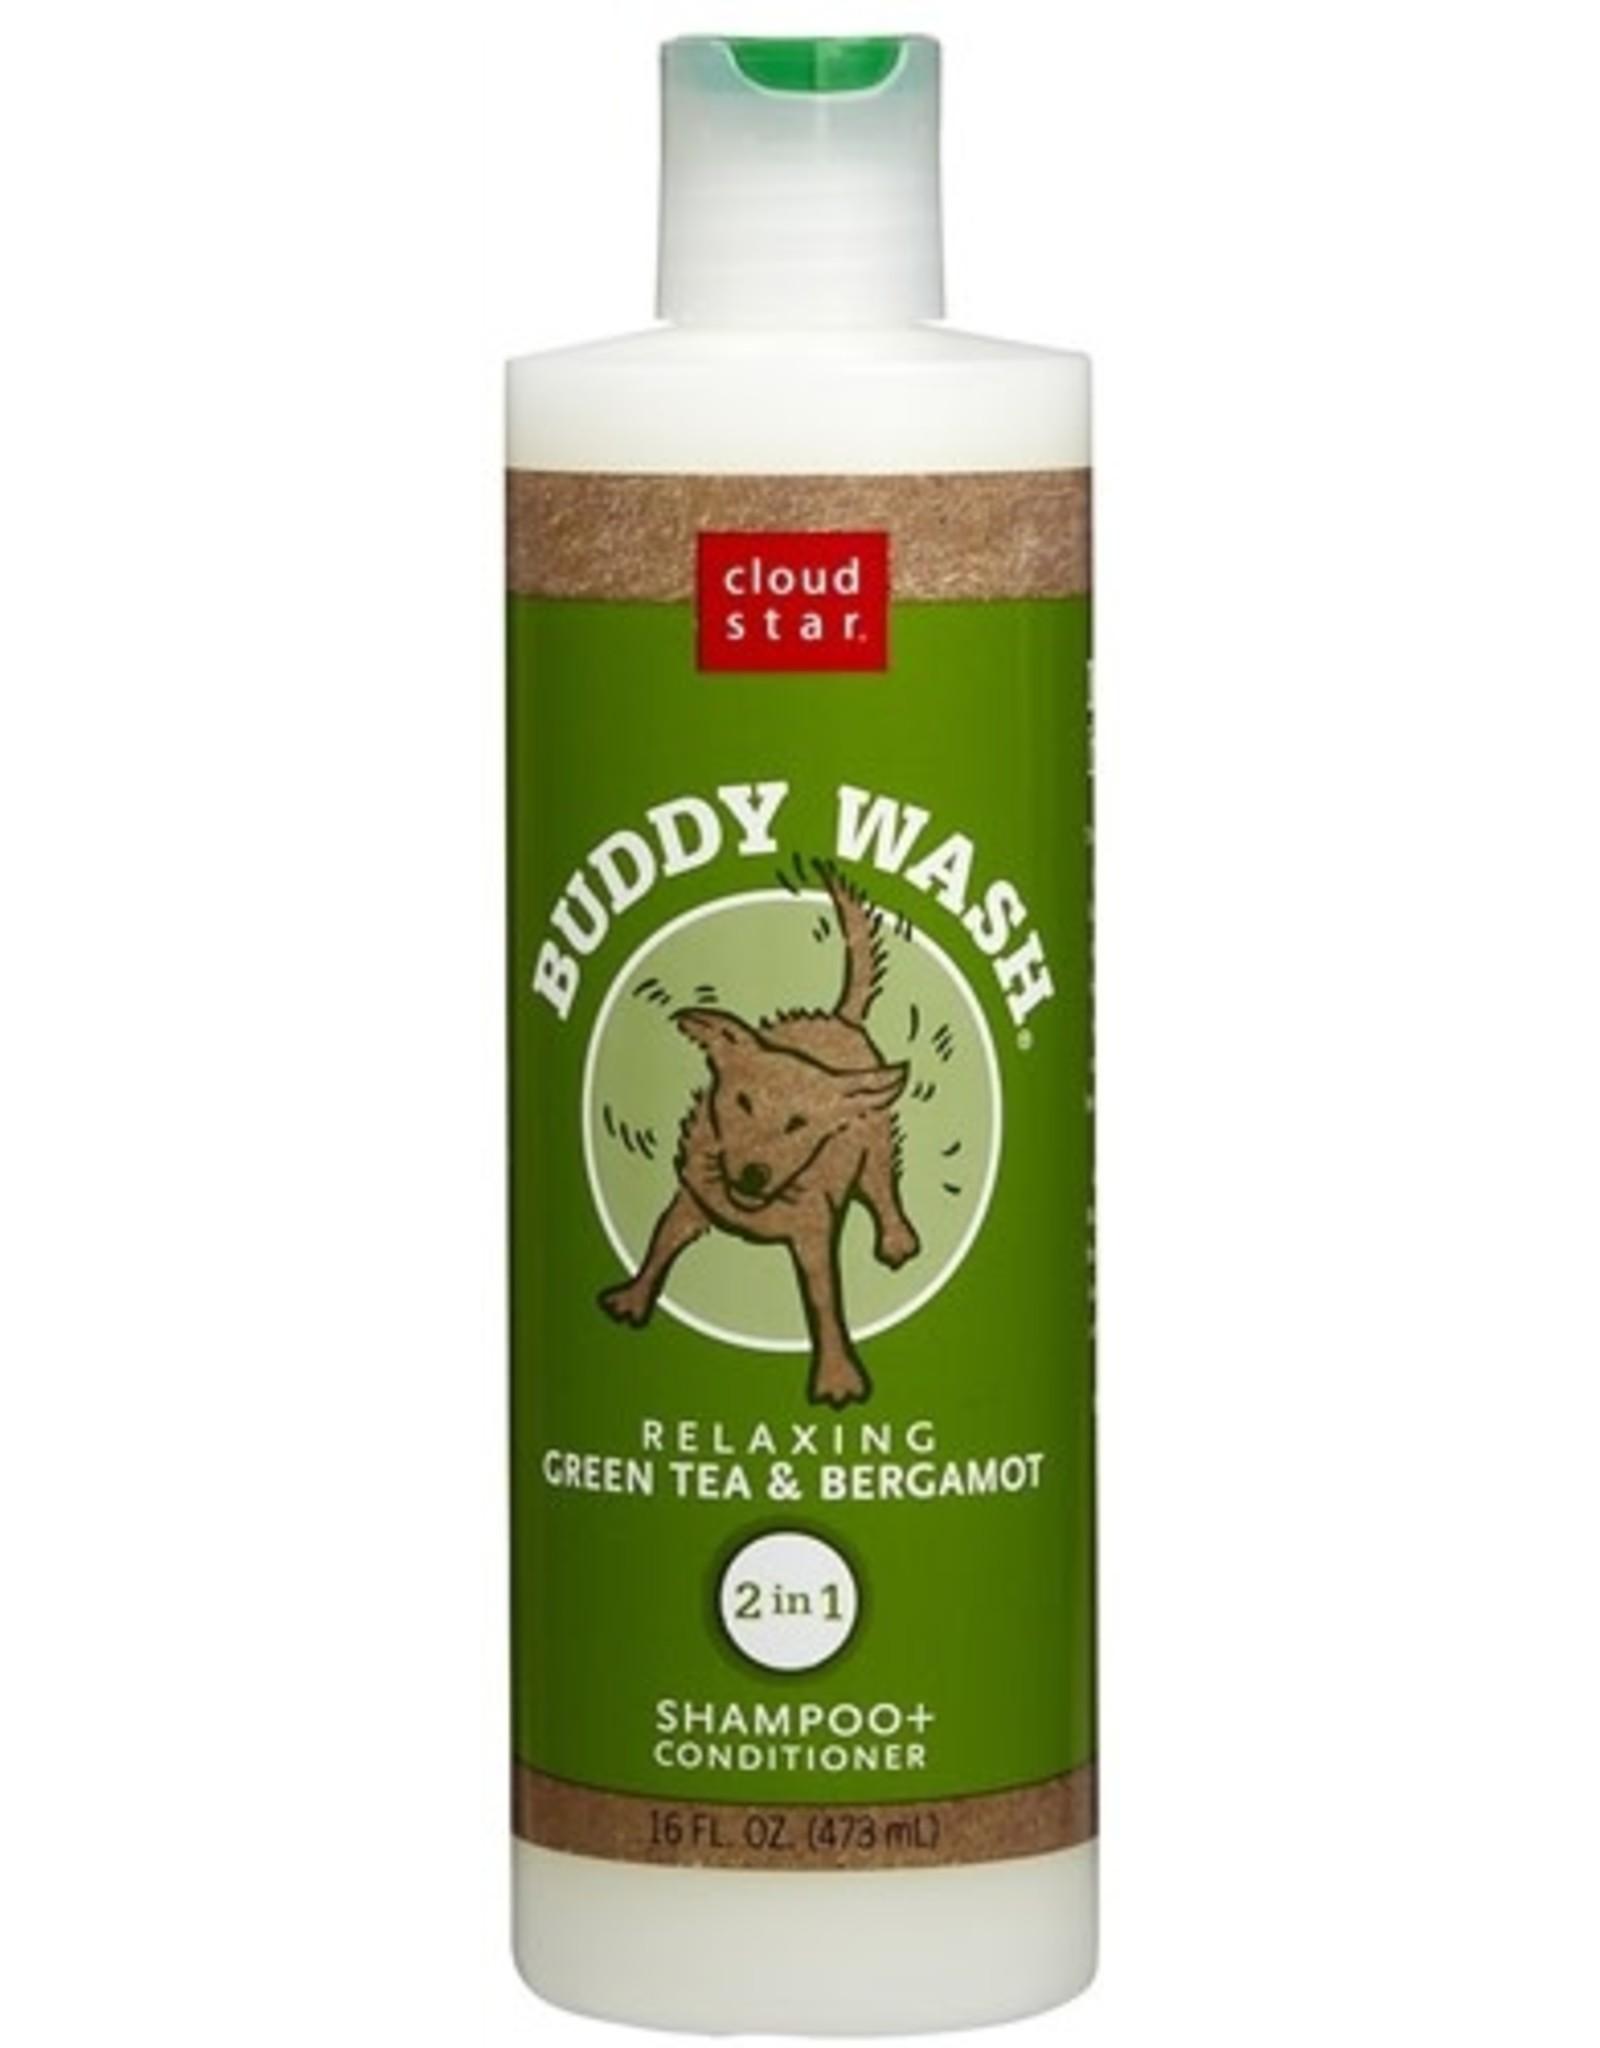 Cloud Star Buddywash: Green Tea & Bergamot Shampoo, 16 oz